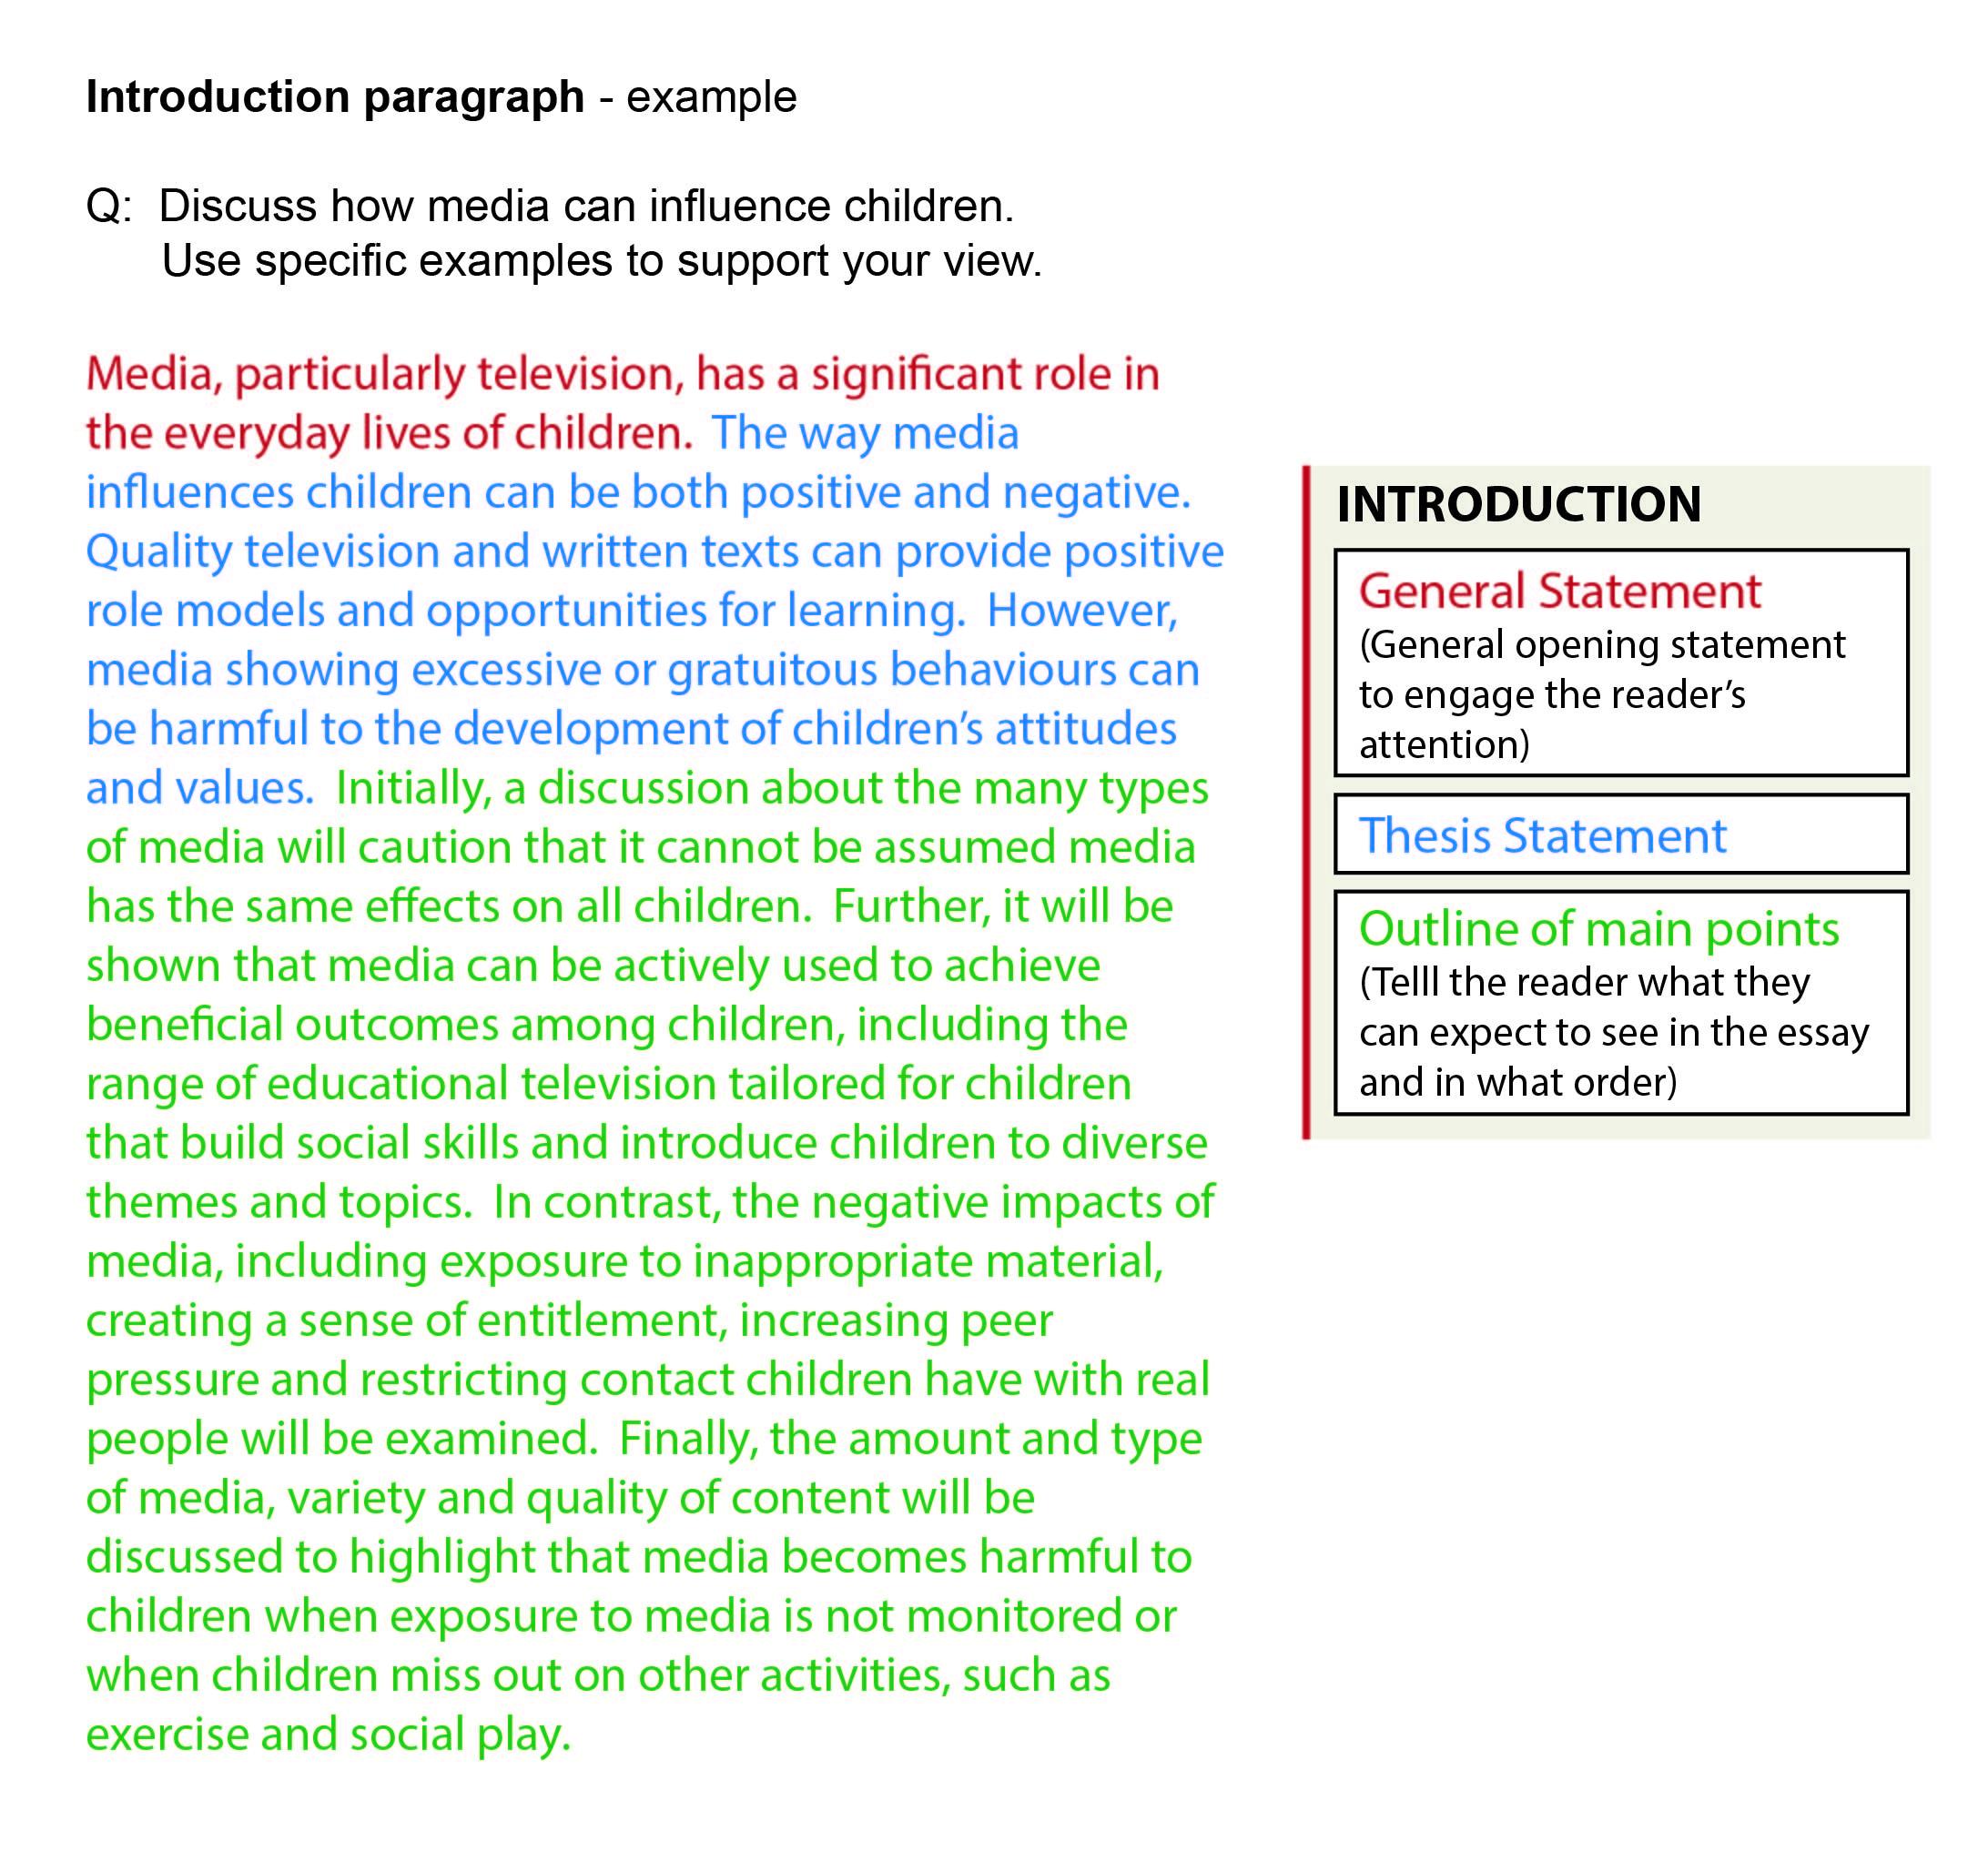 004 Essay Introduction Samples Example Frightening Sample Tagalog Argumentative Format Template Full